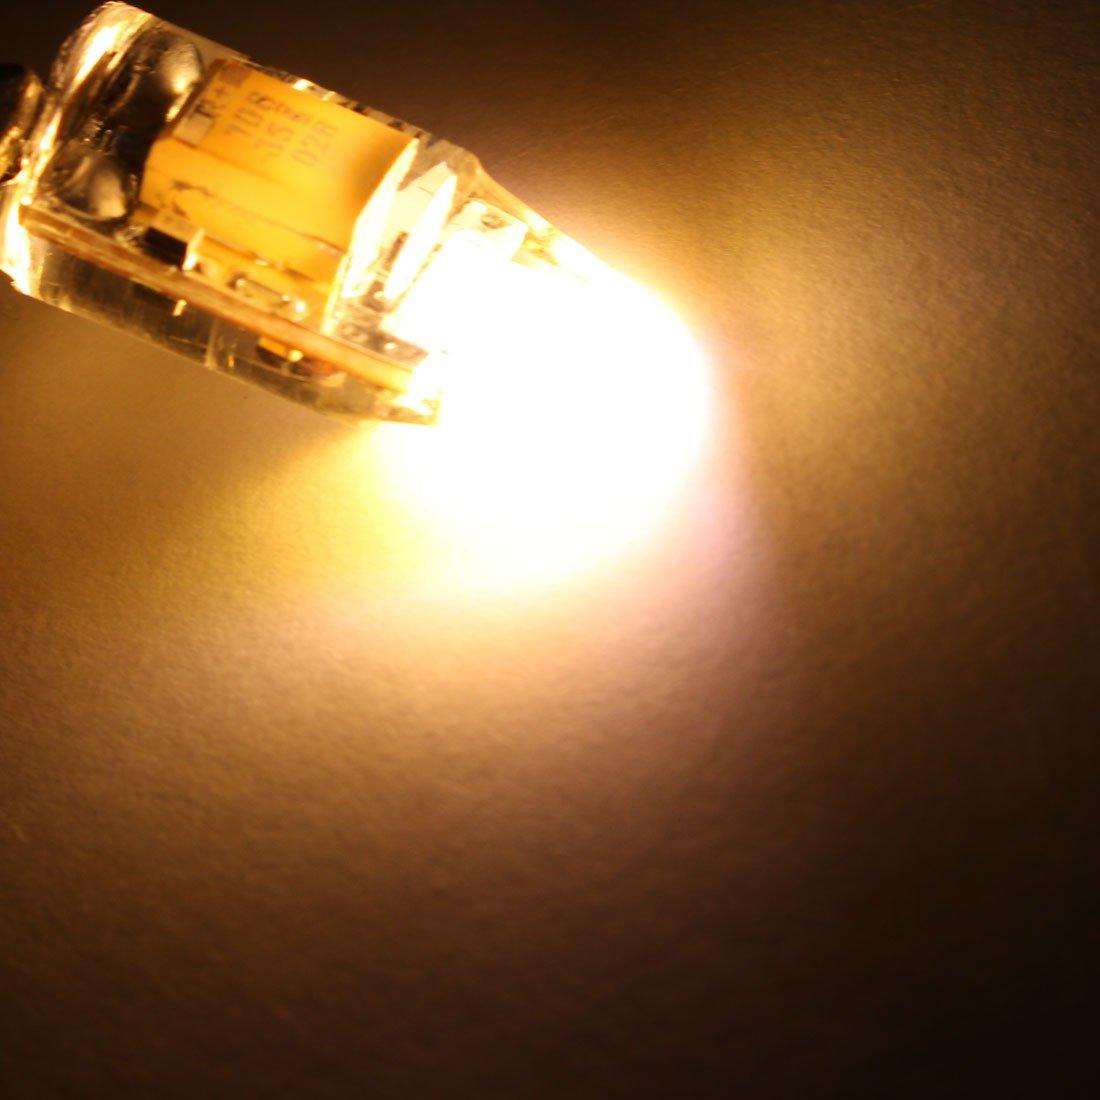 uxcell G4 Base LED Bulb 2W DC12-24V COB Energy Saving Silicone Corn Light Bulb Dimable Warm White 5Pcs